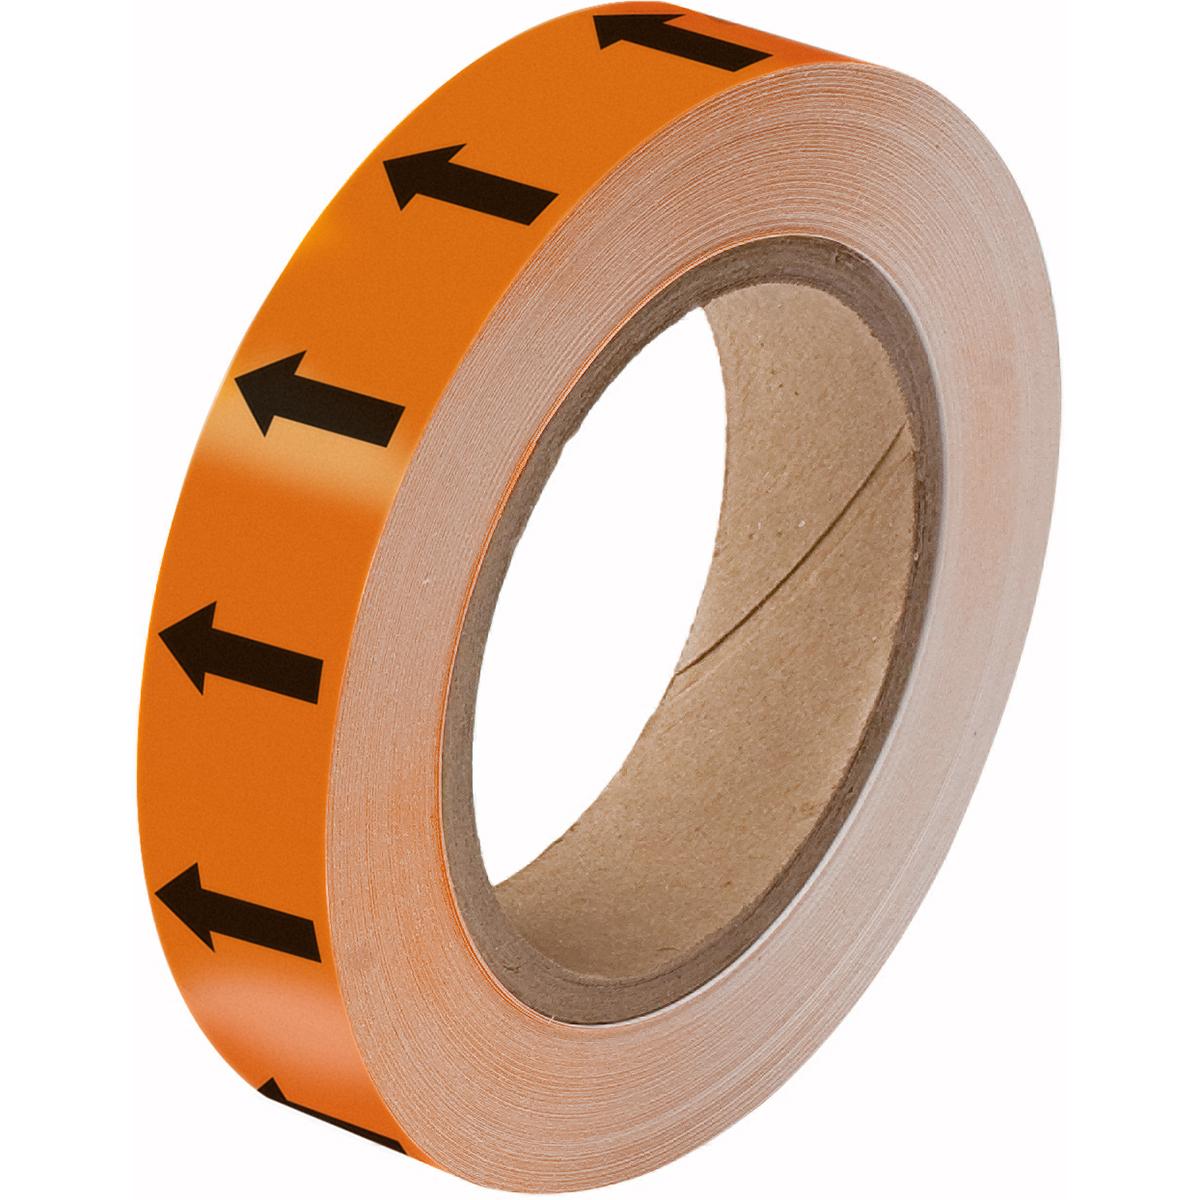 Black on Orange 25mm Directional Flow Arrow Tape